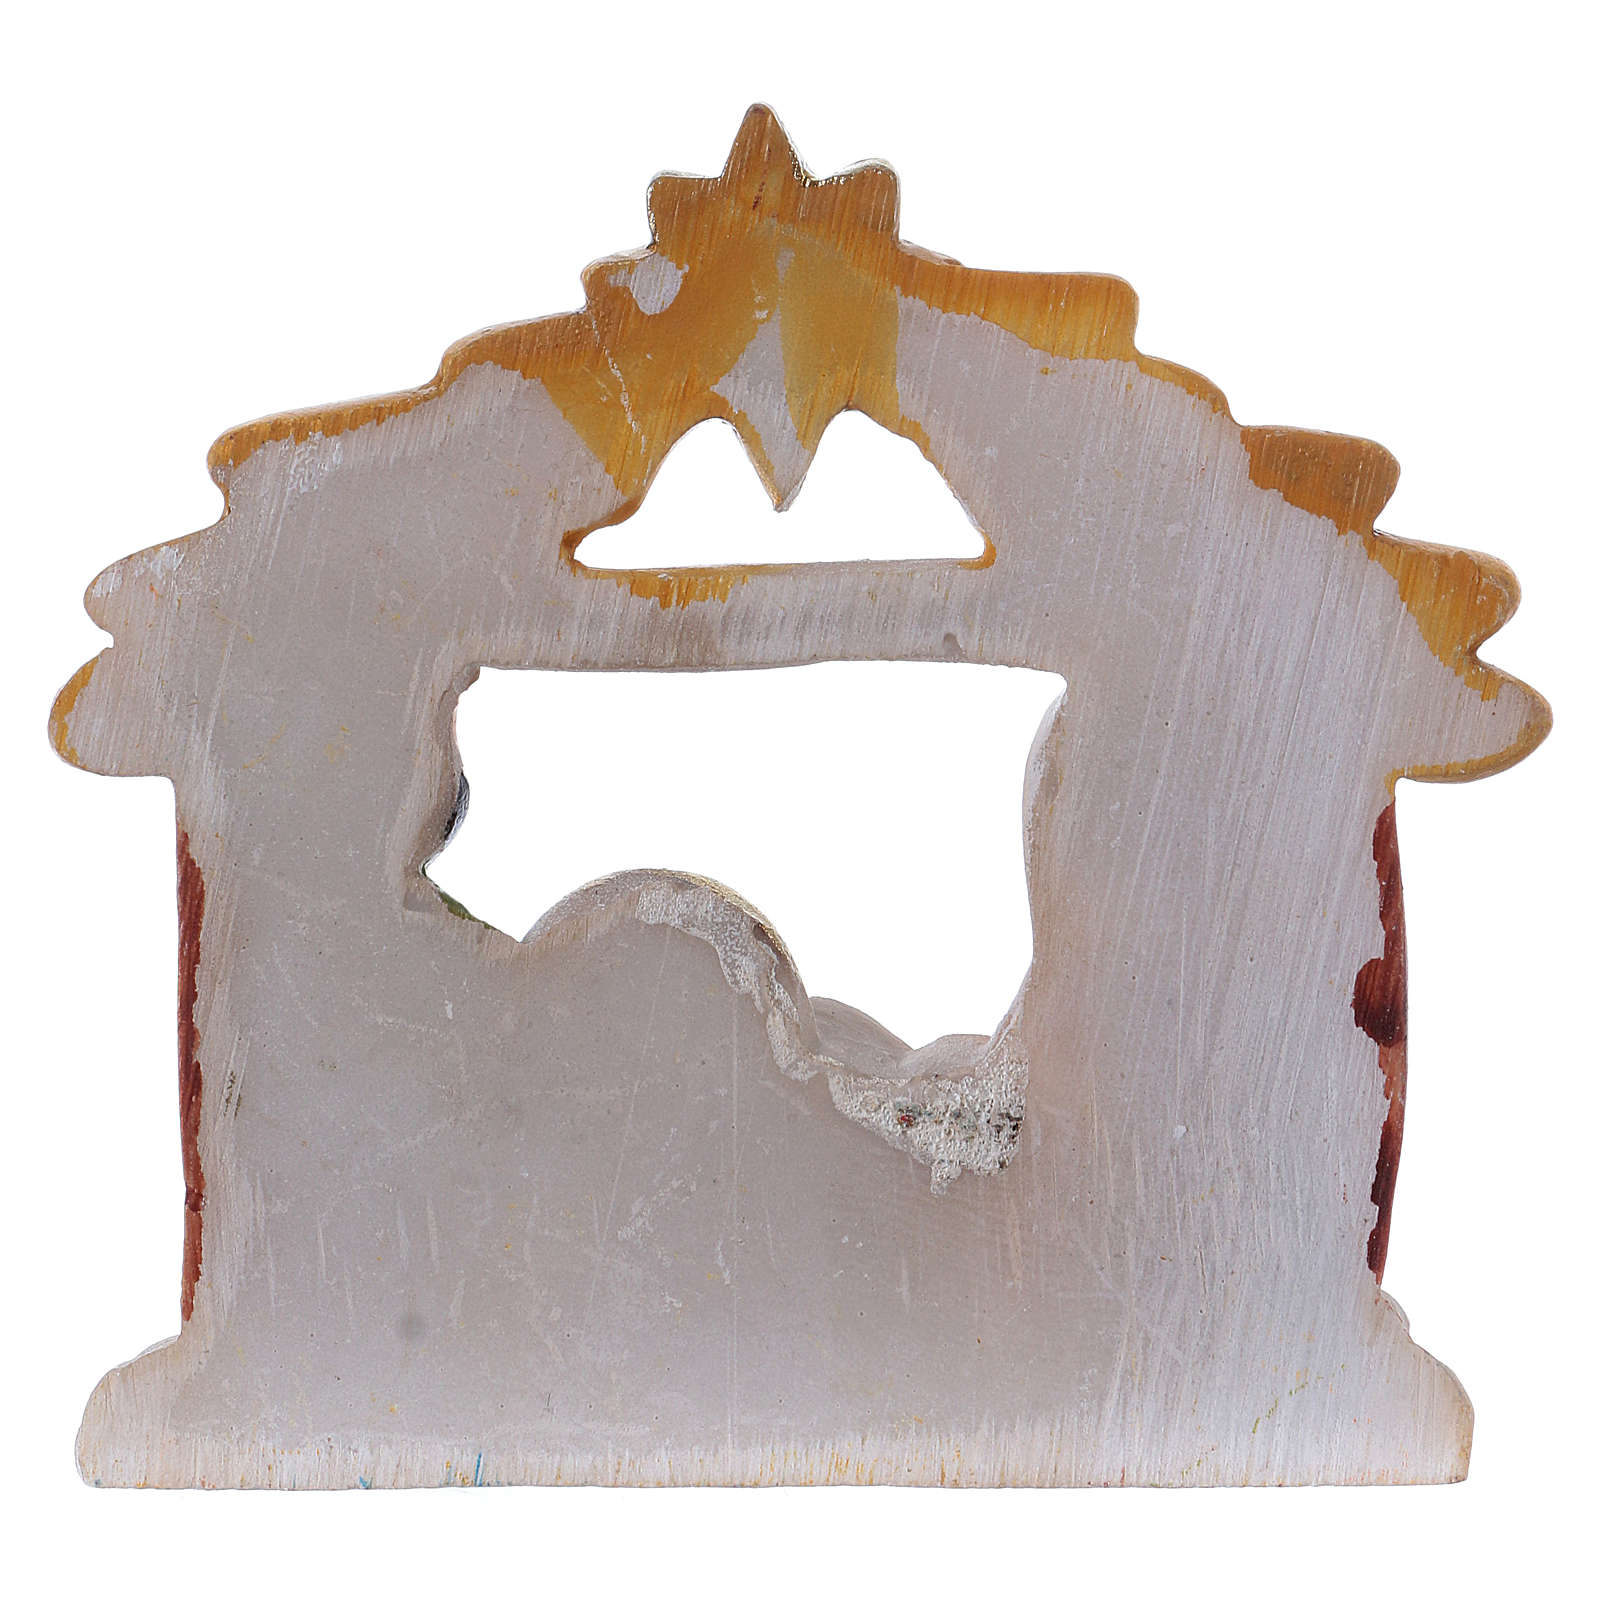 Natività in resina dipinta con capanna 6,5 cm 3